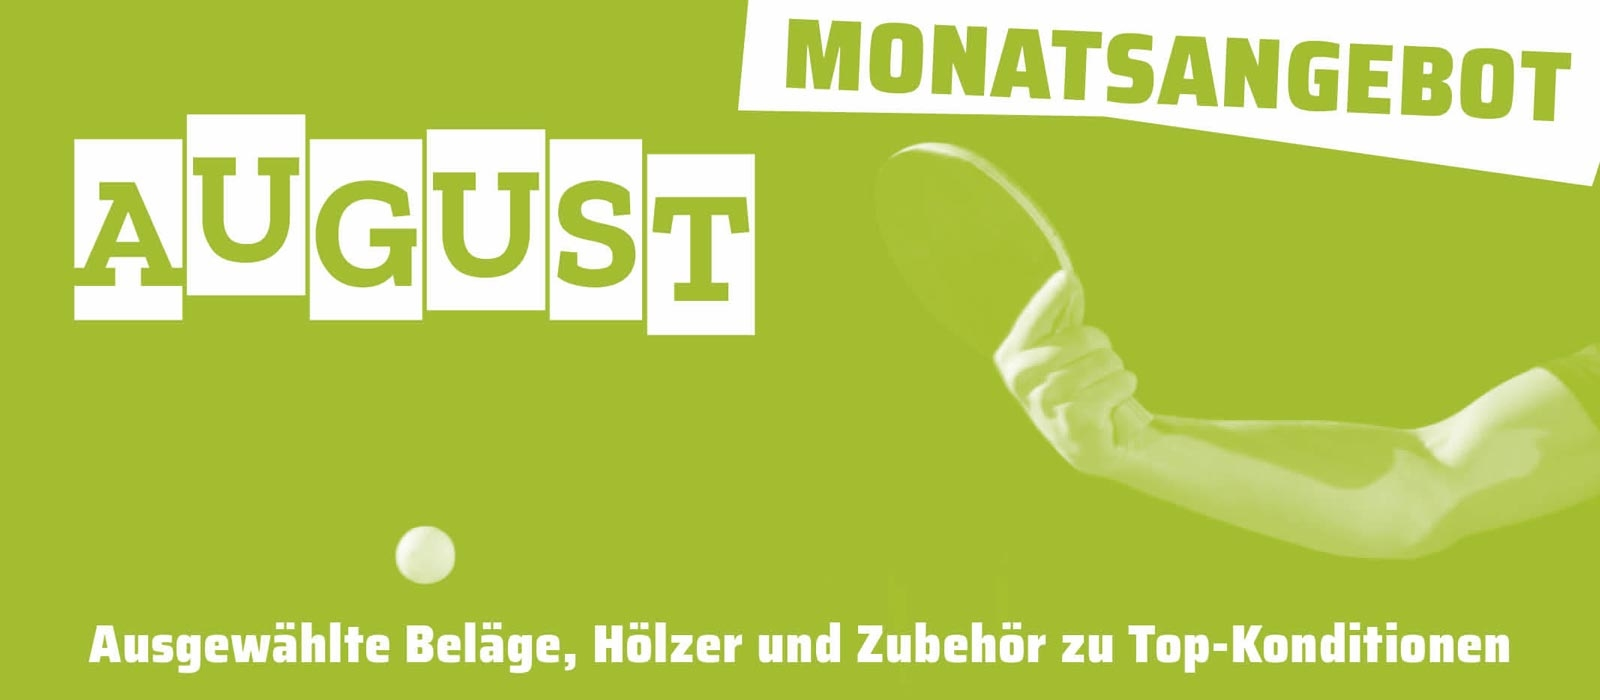 Monatsangebot August 2019